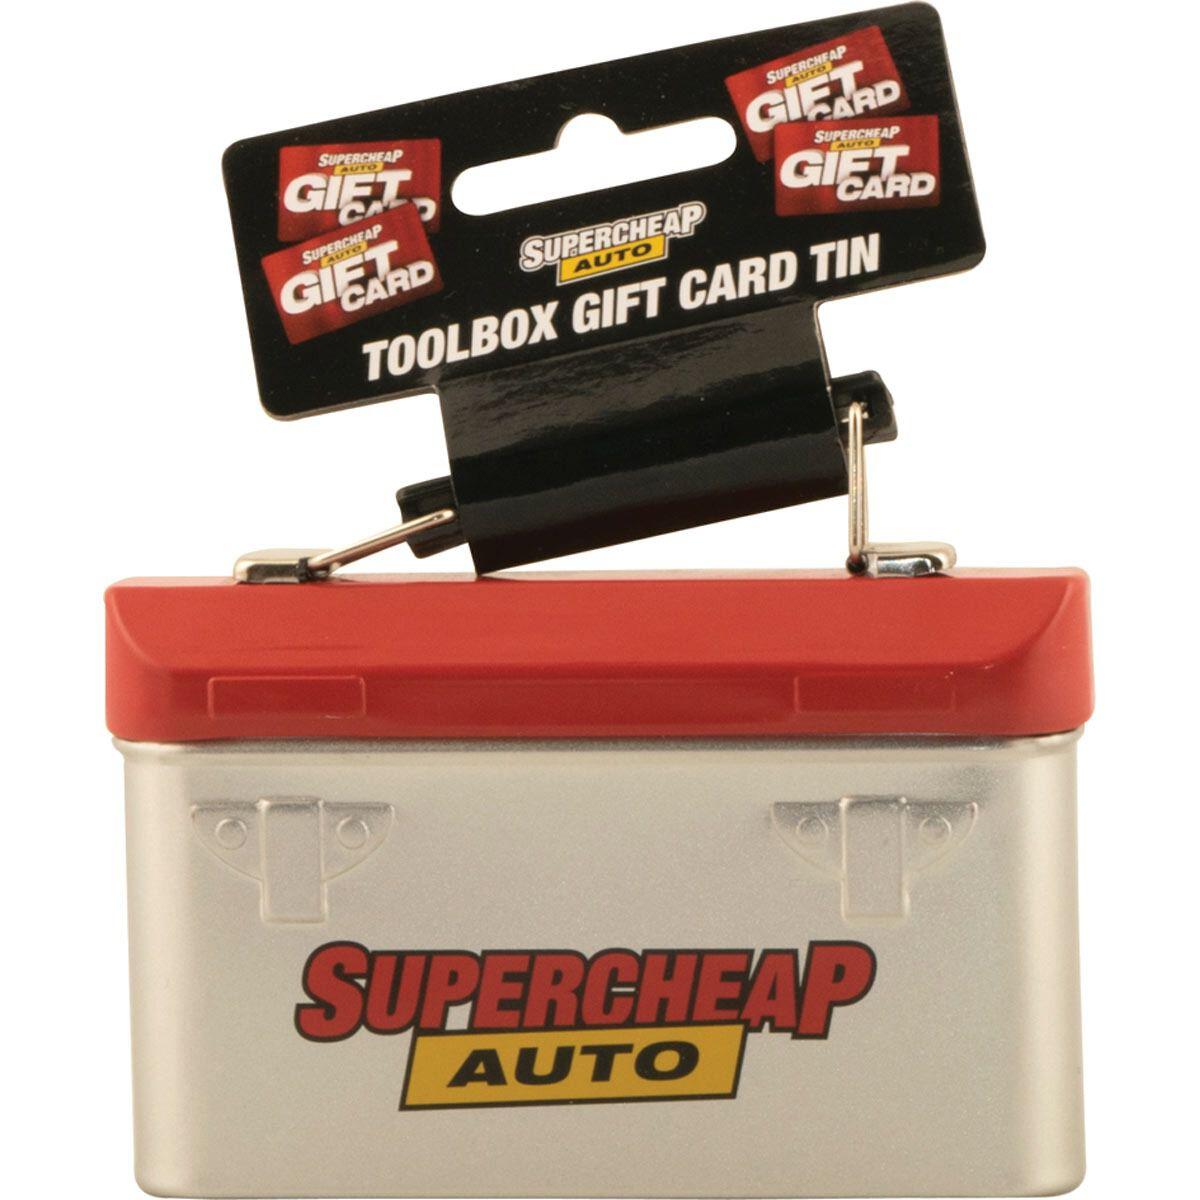 Gift Card Holder Toolbox | Supercheap Auto